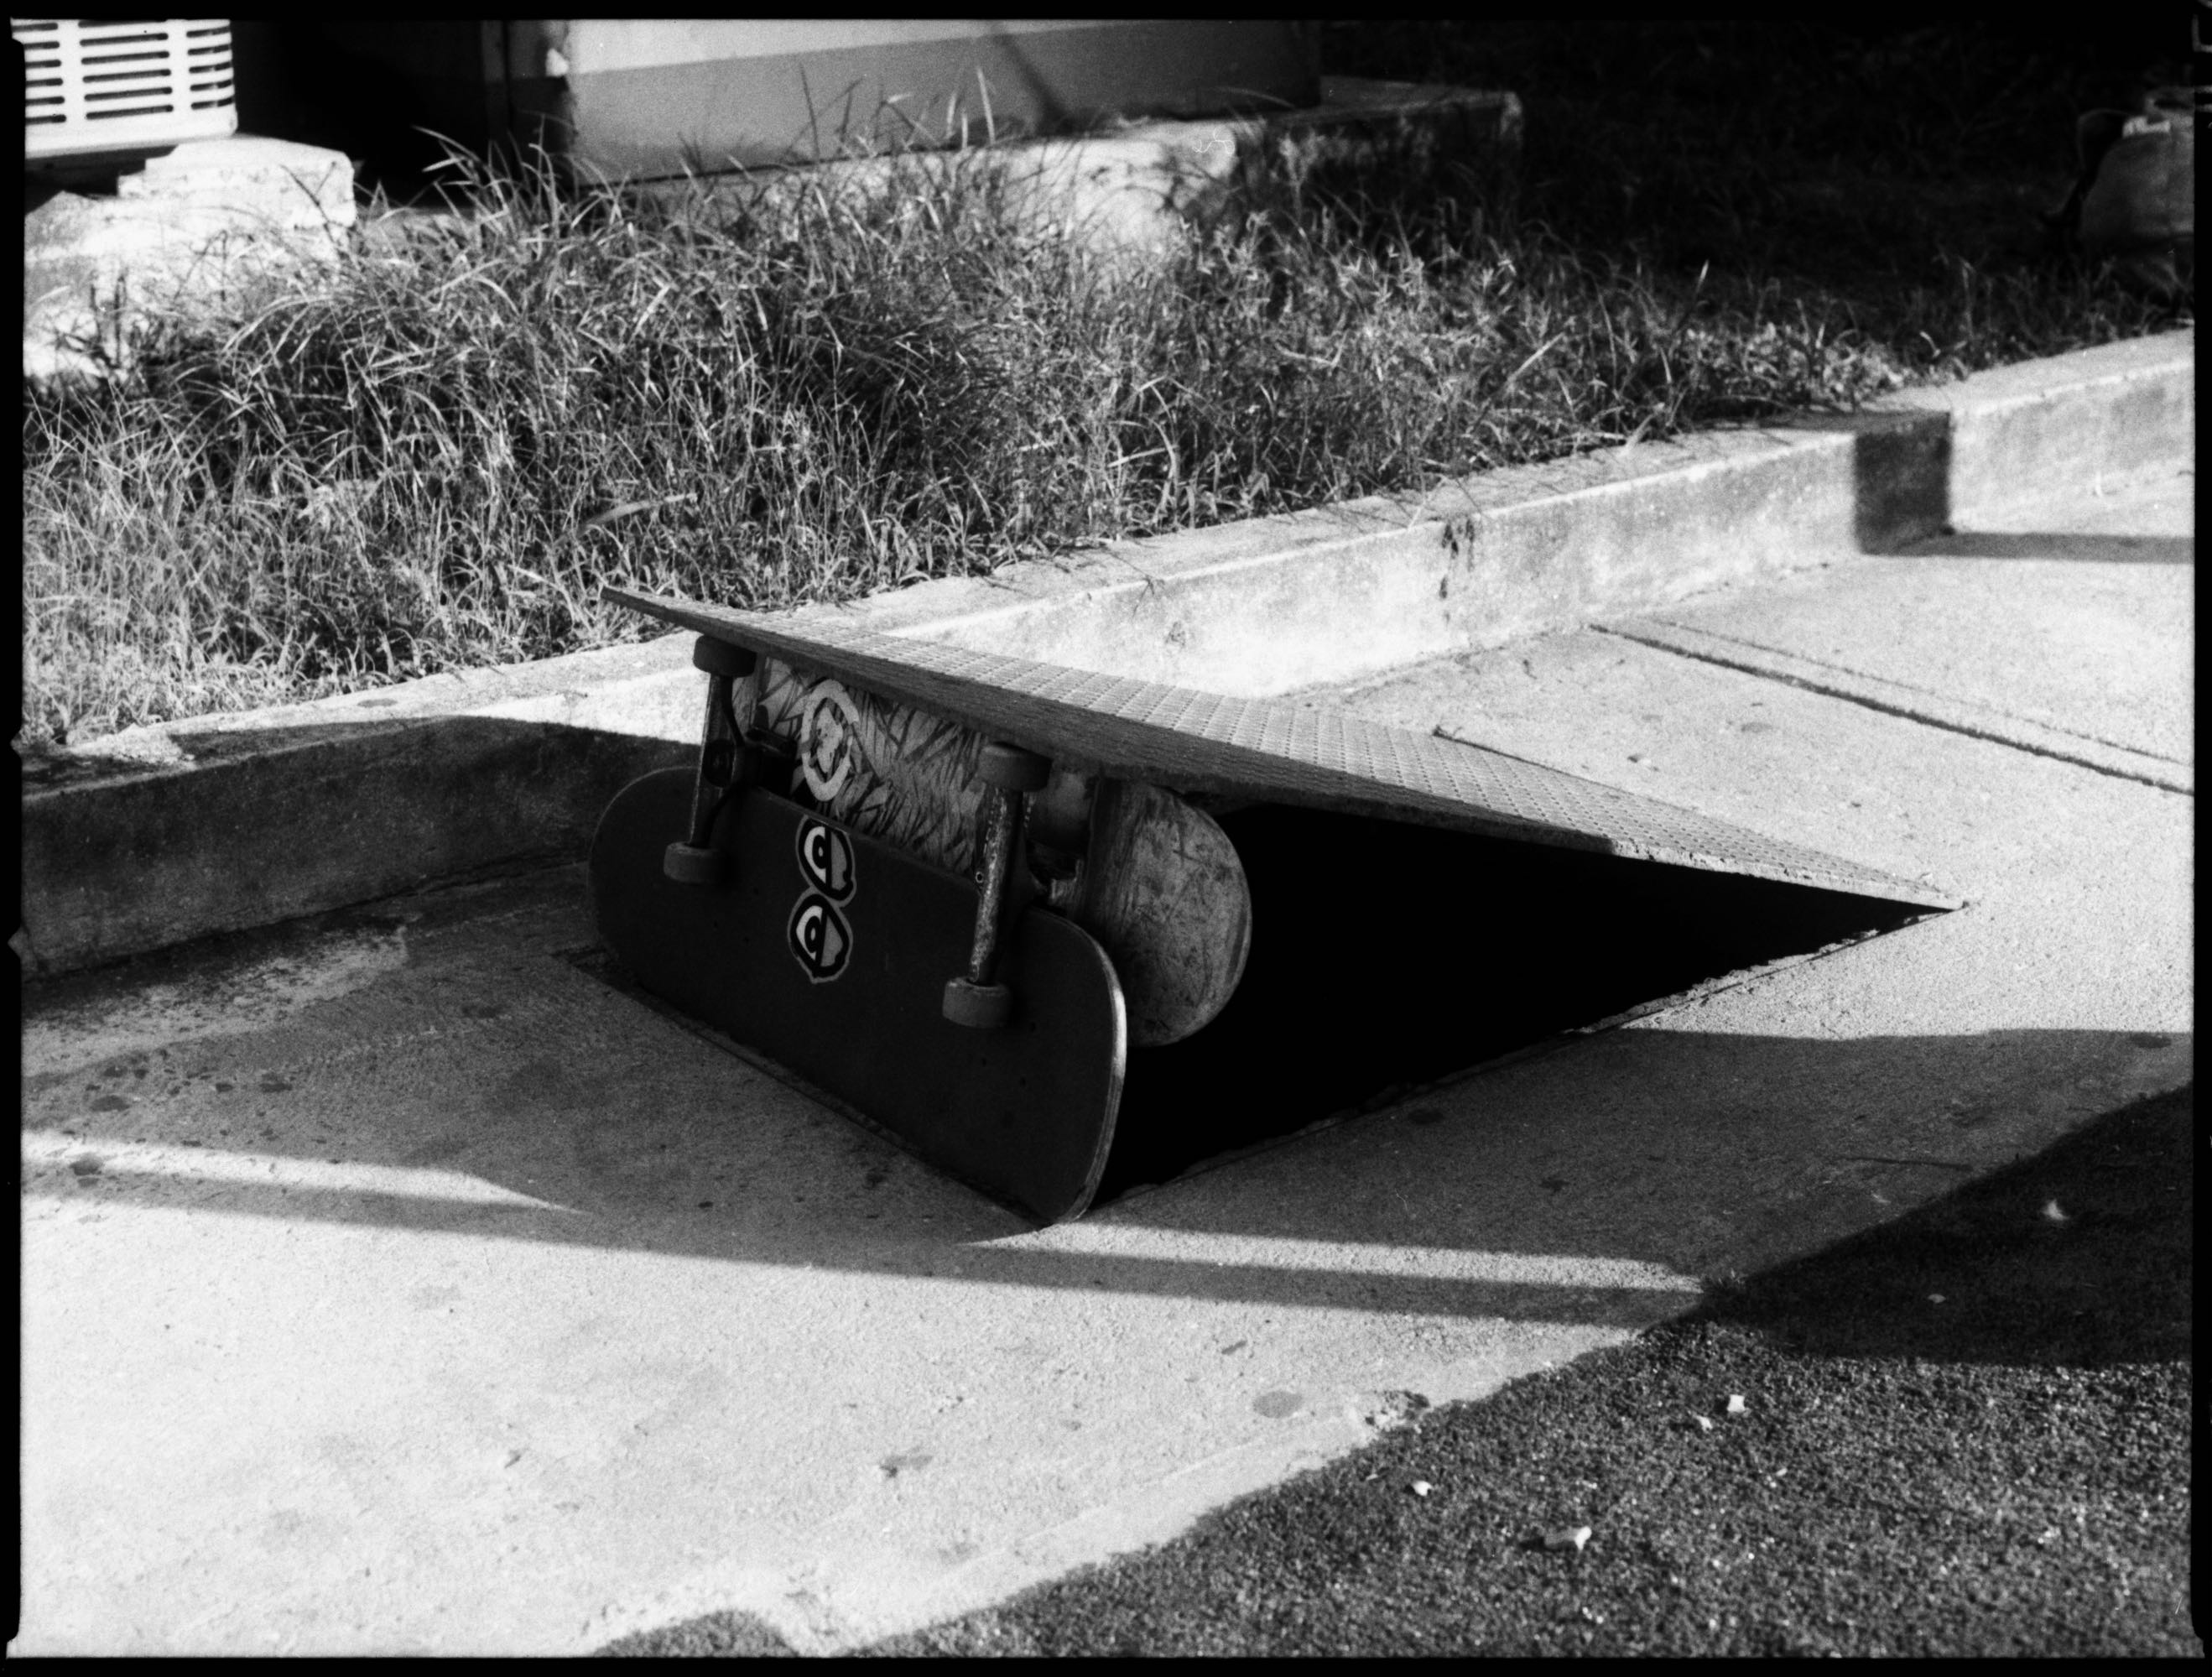 Rafael Gonzalez 10 - Street life